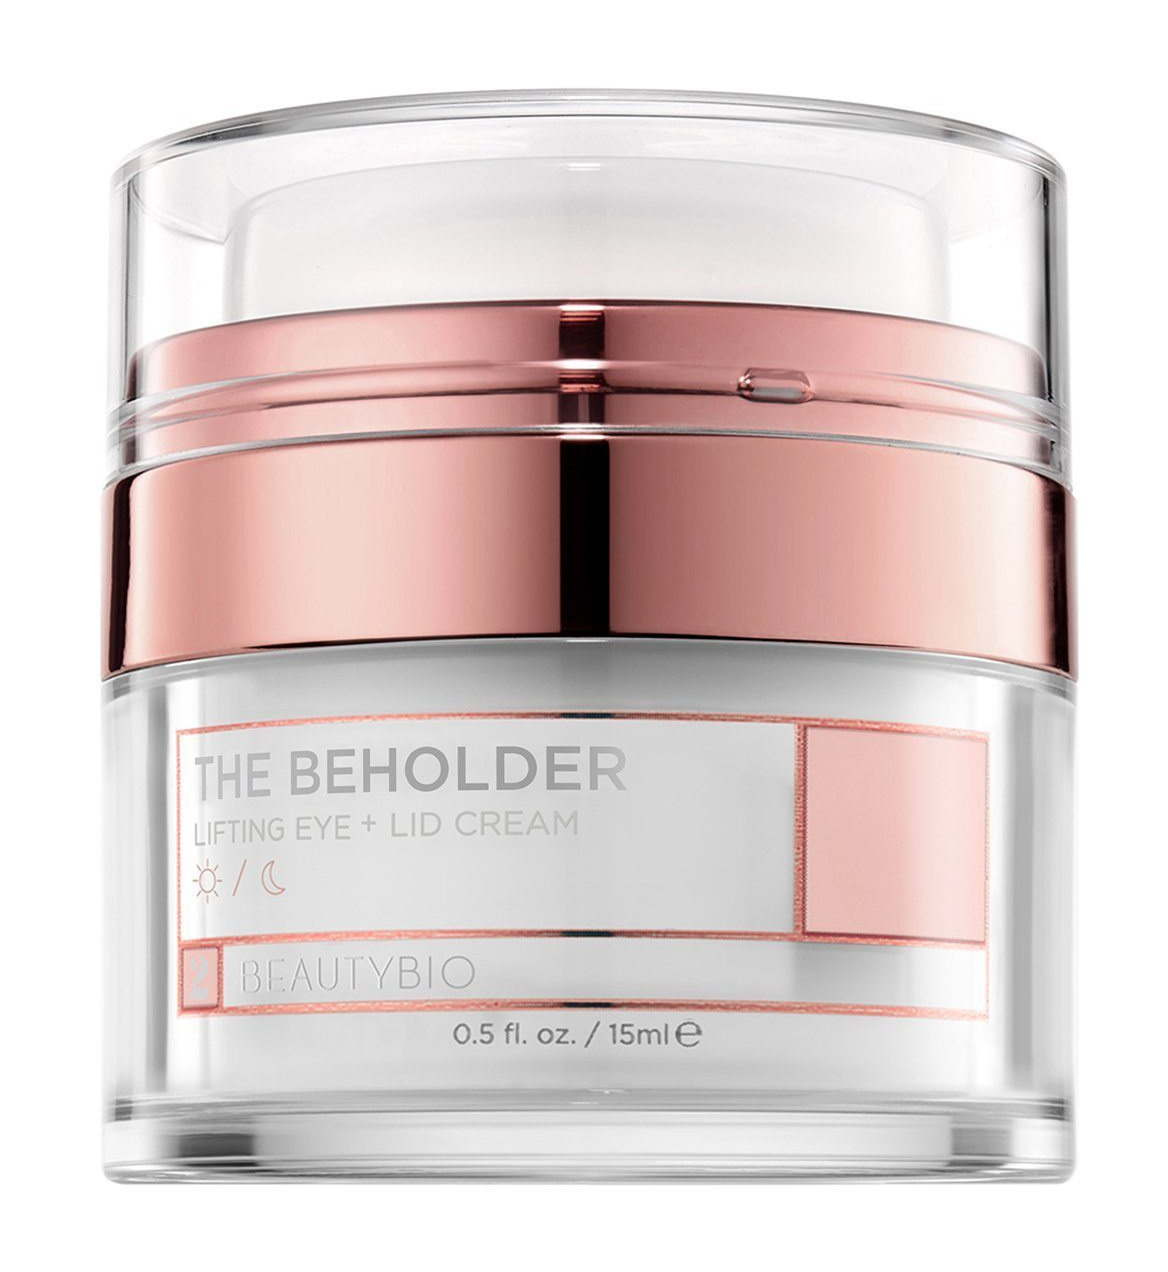 Beautybio The Beholder Lifting Eye + Lid Cream